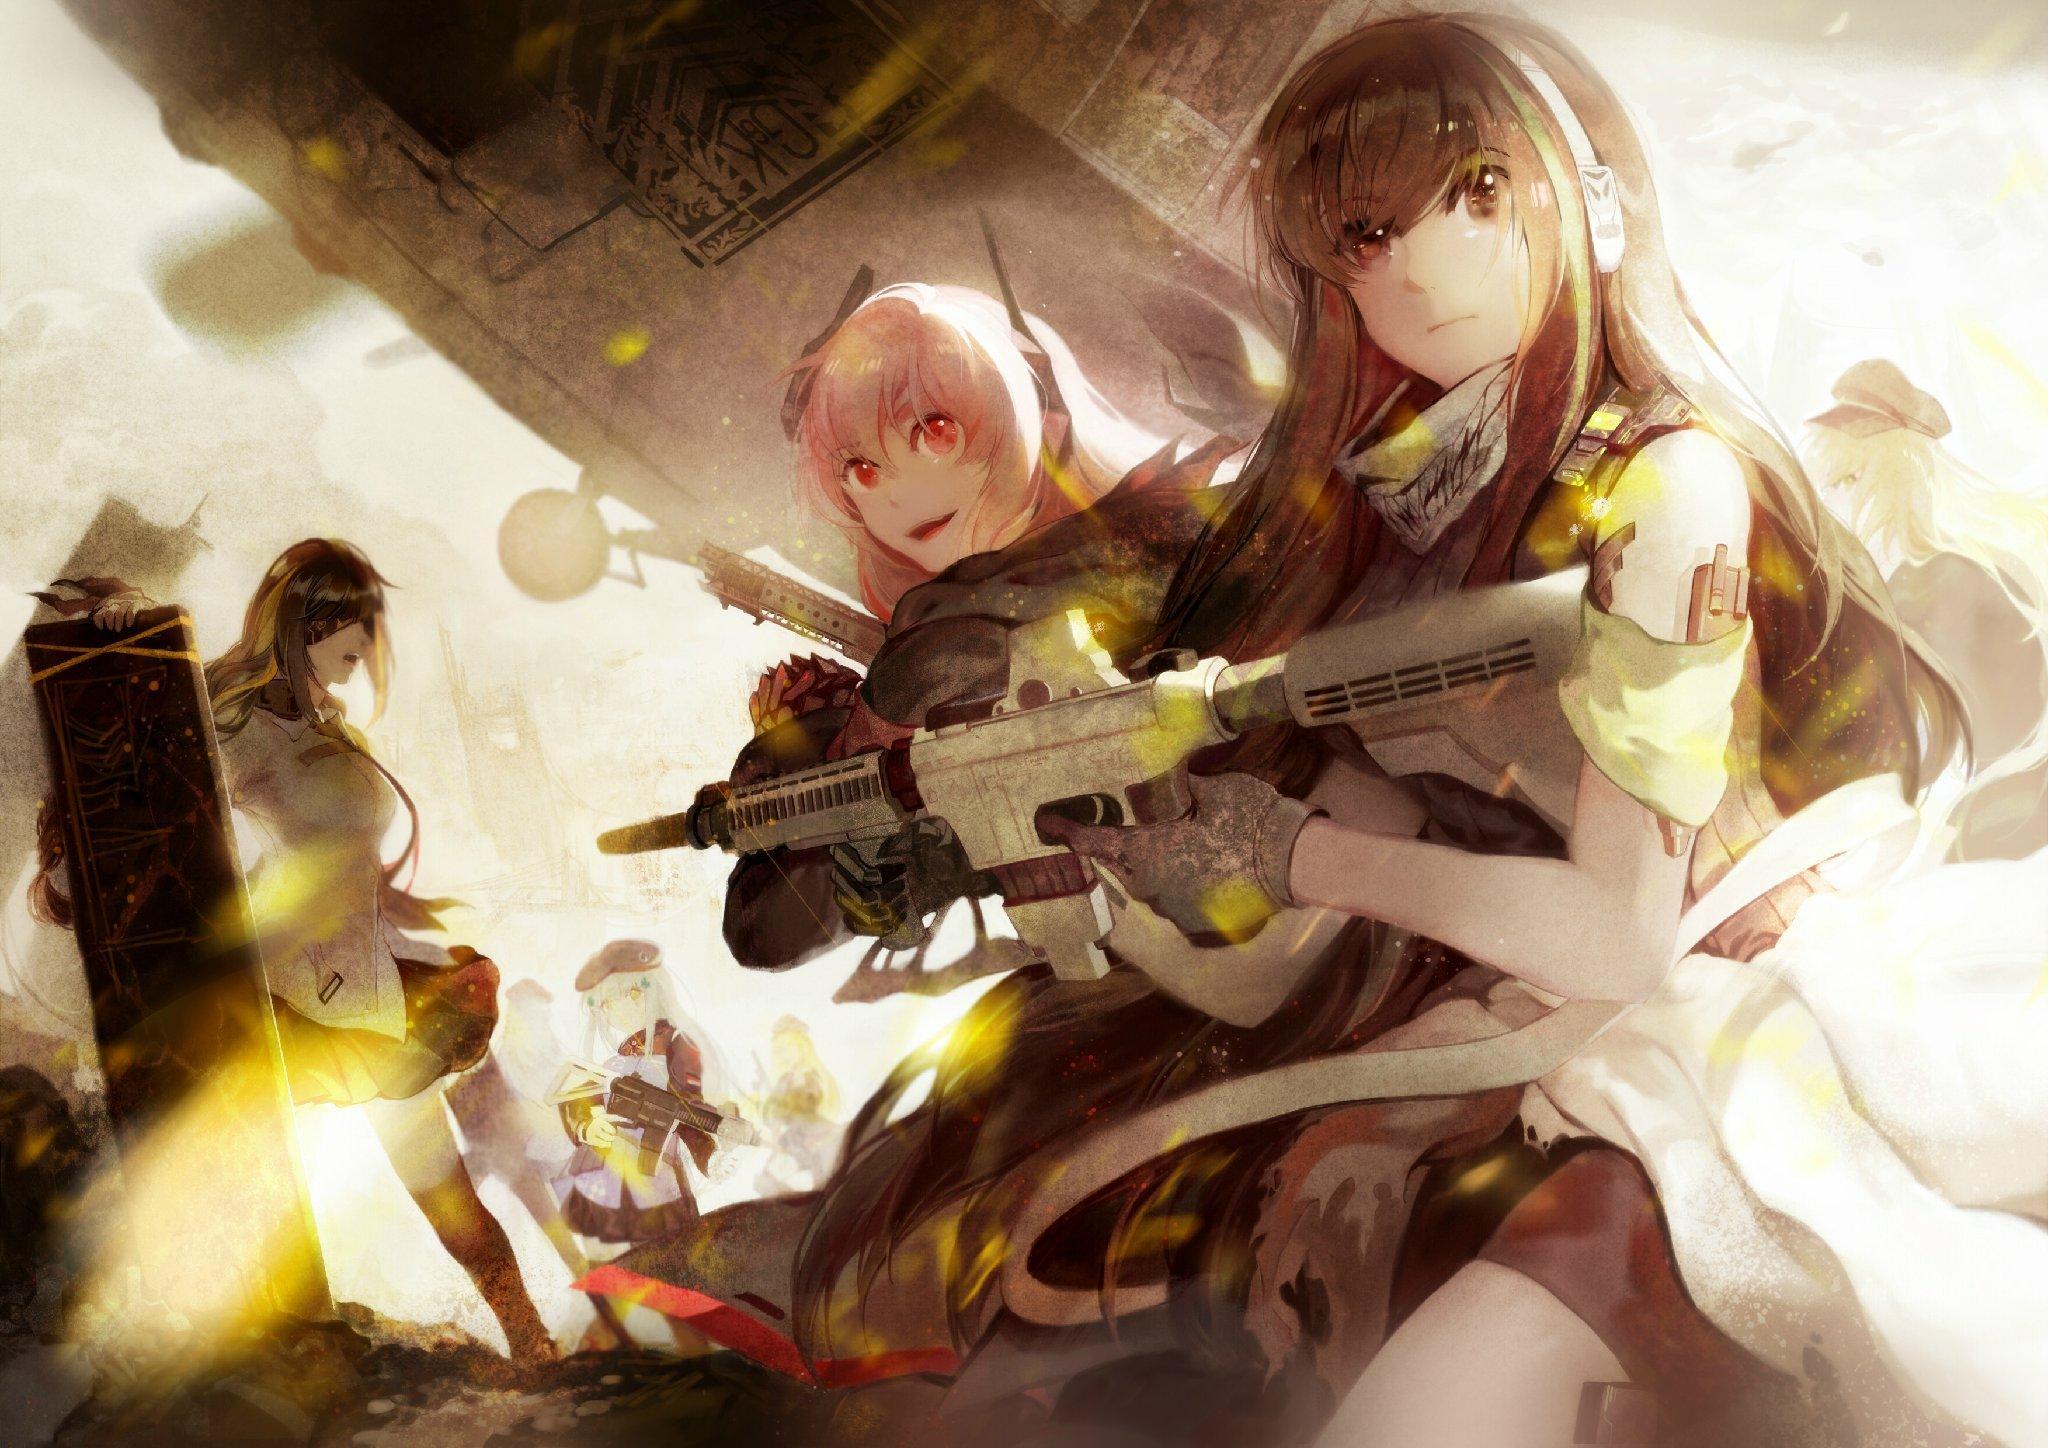 Girls Frontline Ww2 Wallpaper Extraction Point Girls Frontline Gunime